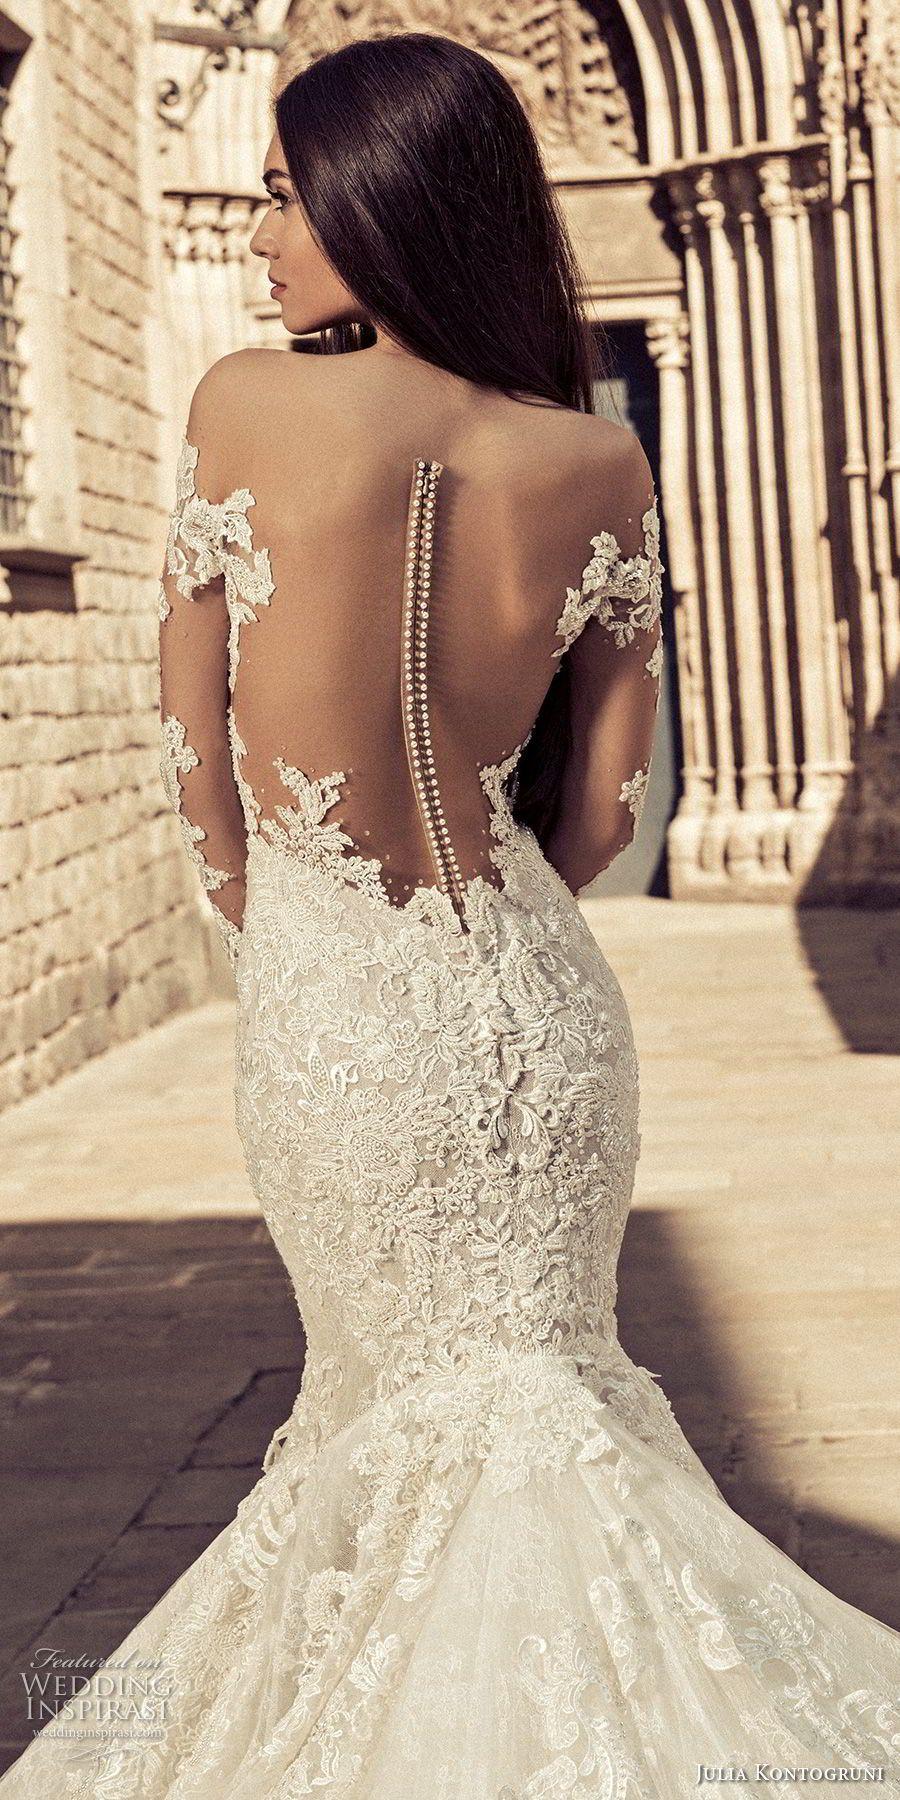 Plus size african wedding dresses  julia kontogruni  bridal long sleeves sweetheart neckline full